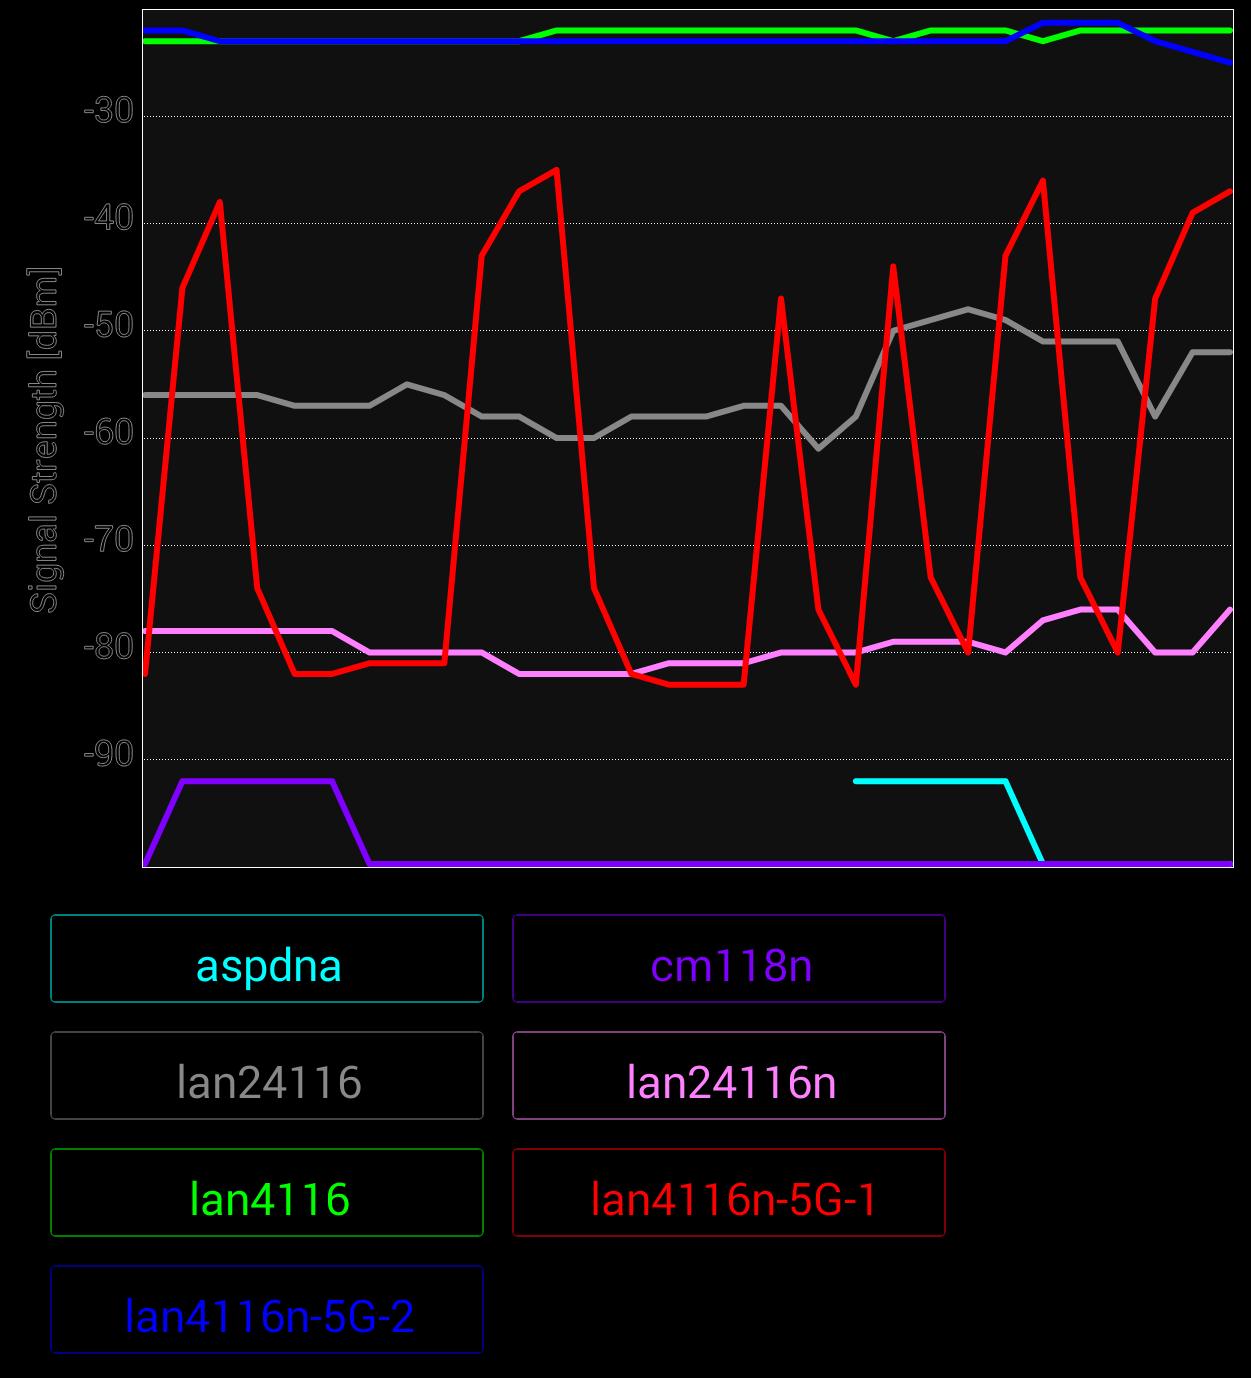 Netgear Nighthawk X6 tri-band R8000 router | Jim Rome's Interactive Site